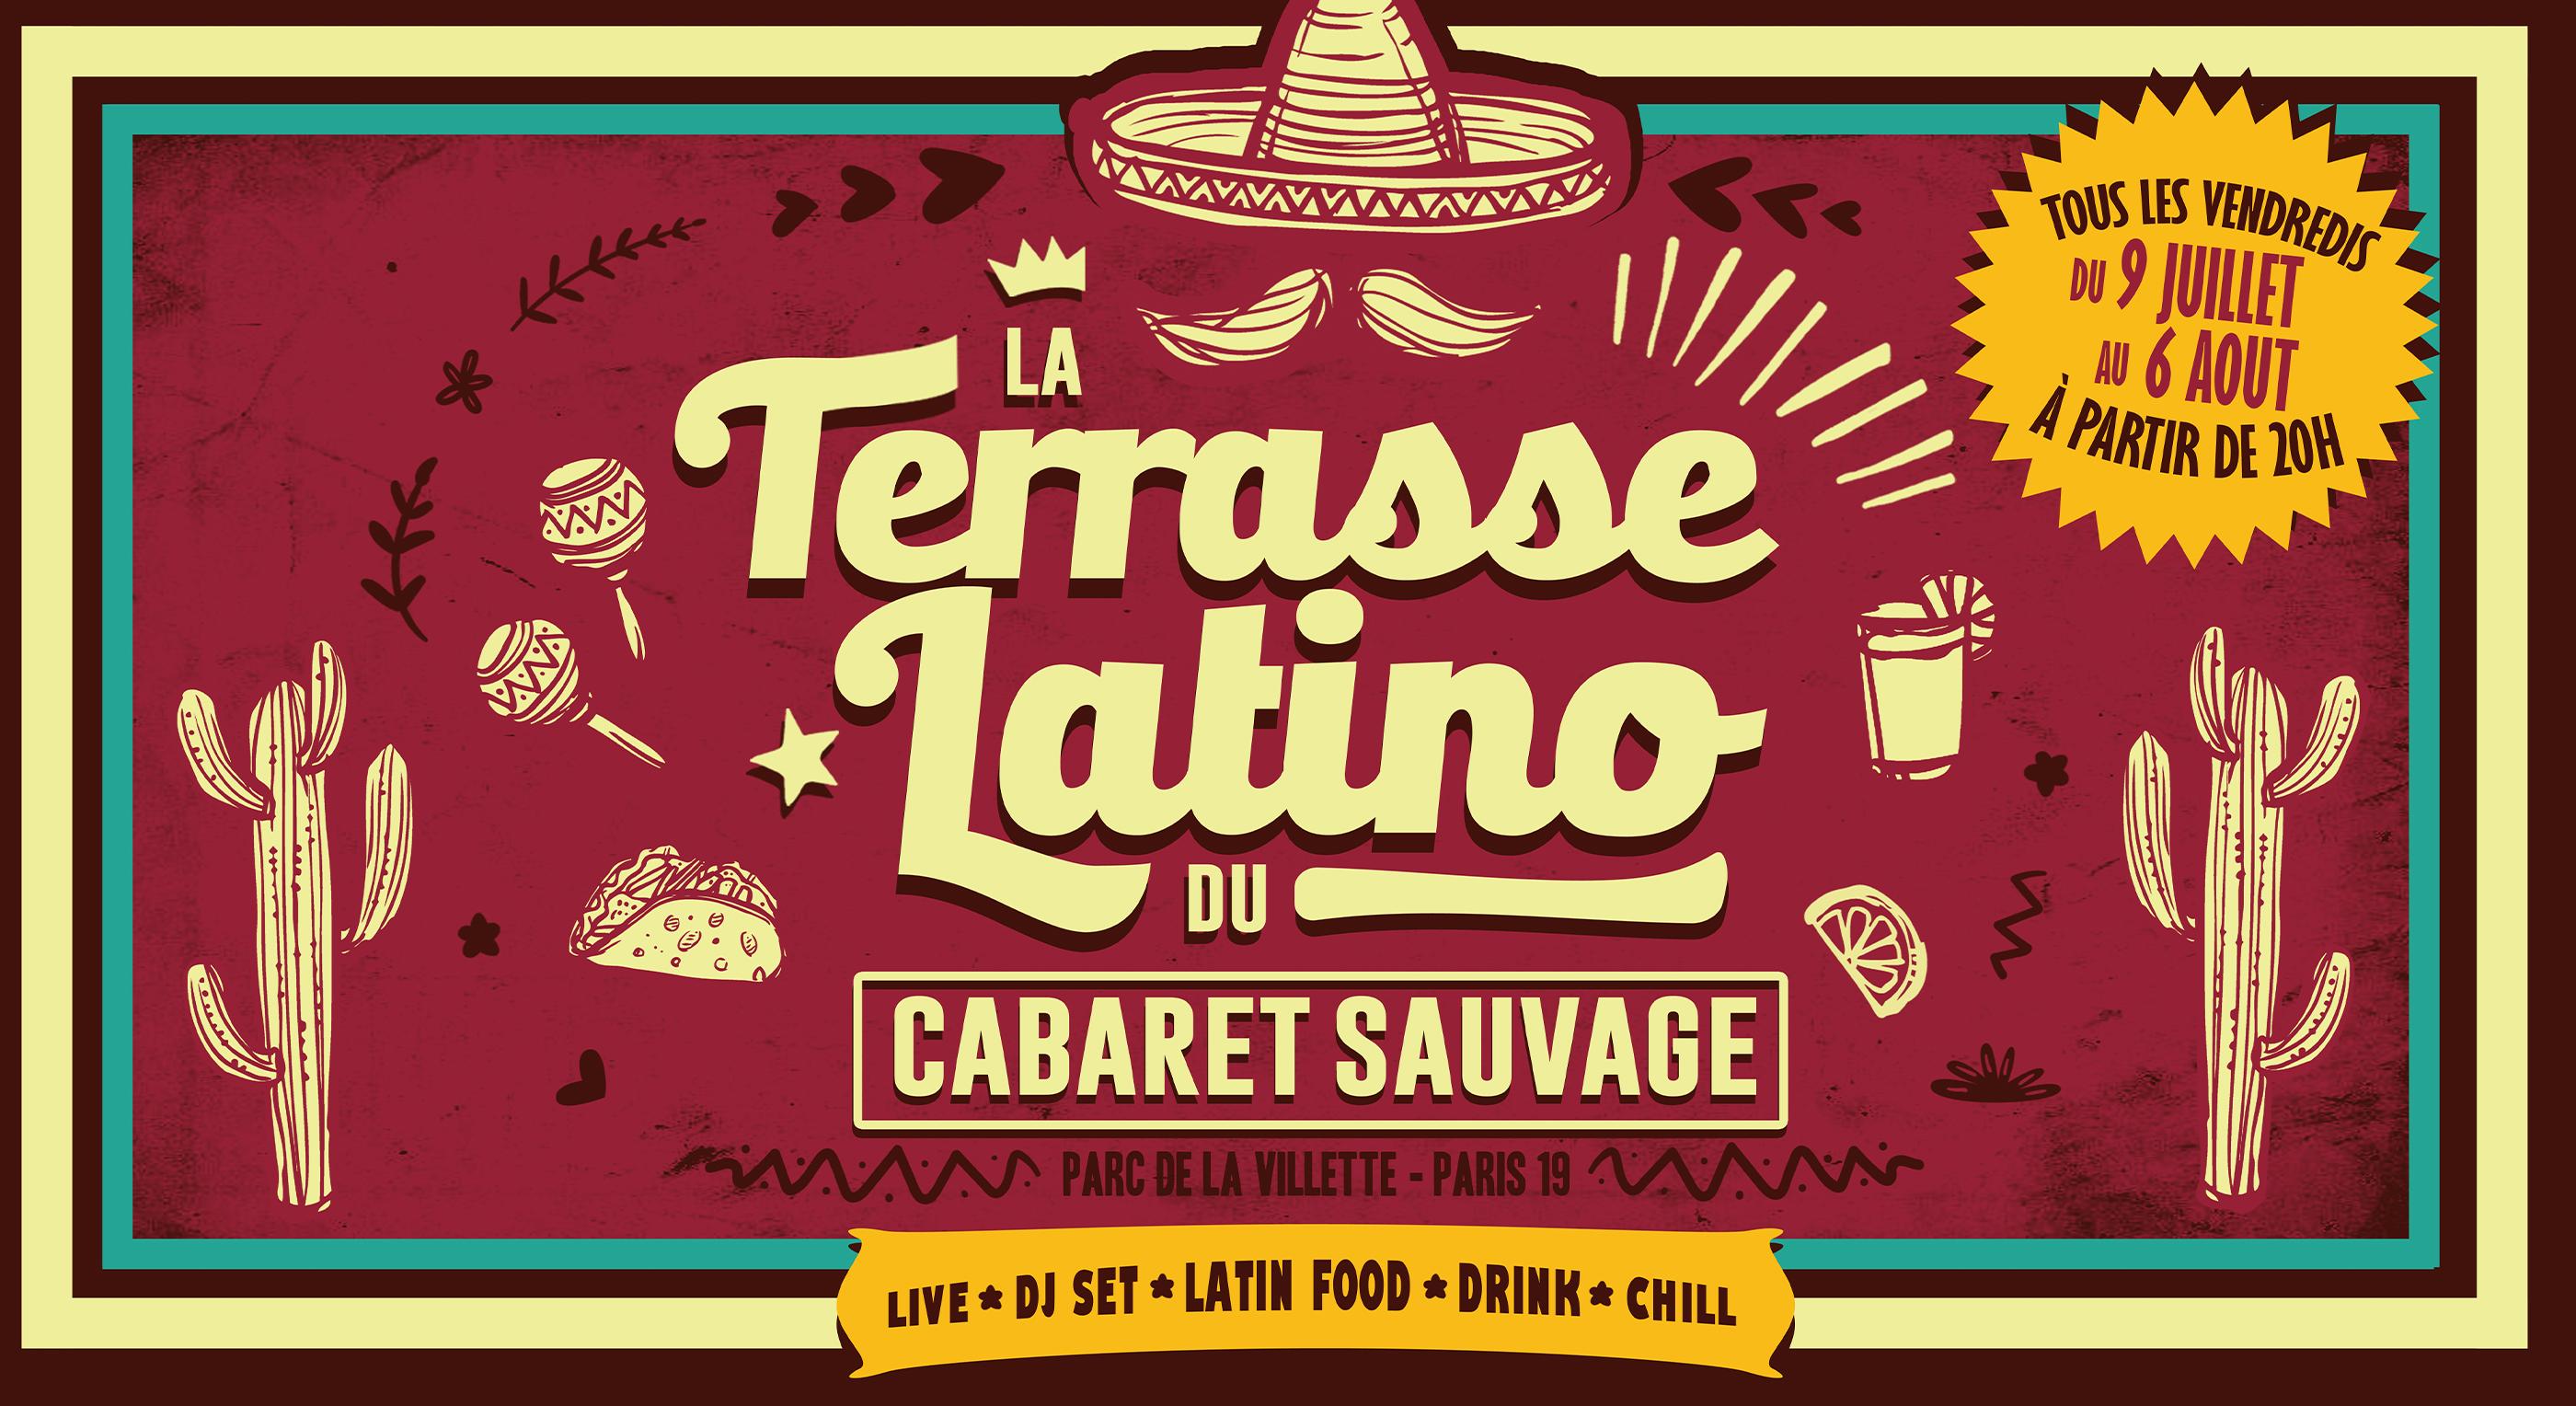 La Terrasse Latino - Vendredi 23 Juillet 2021